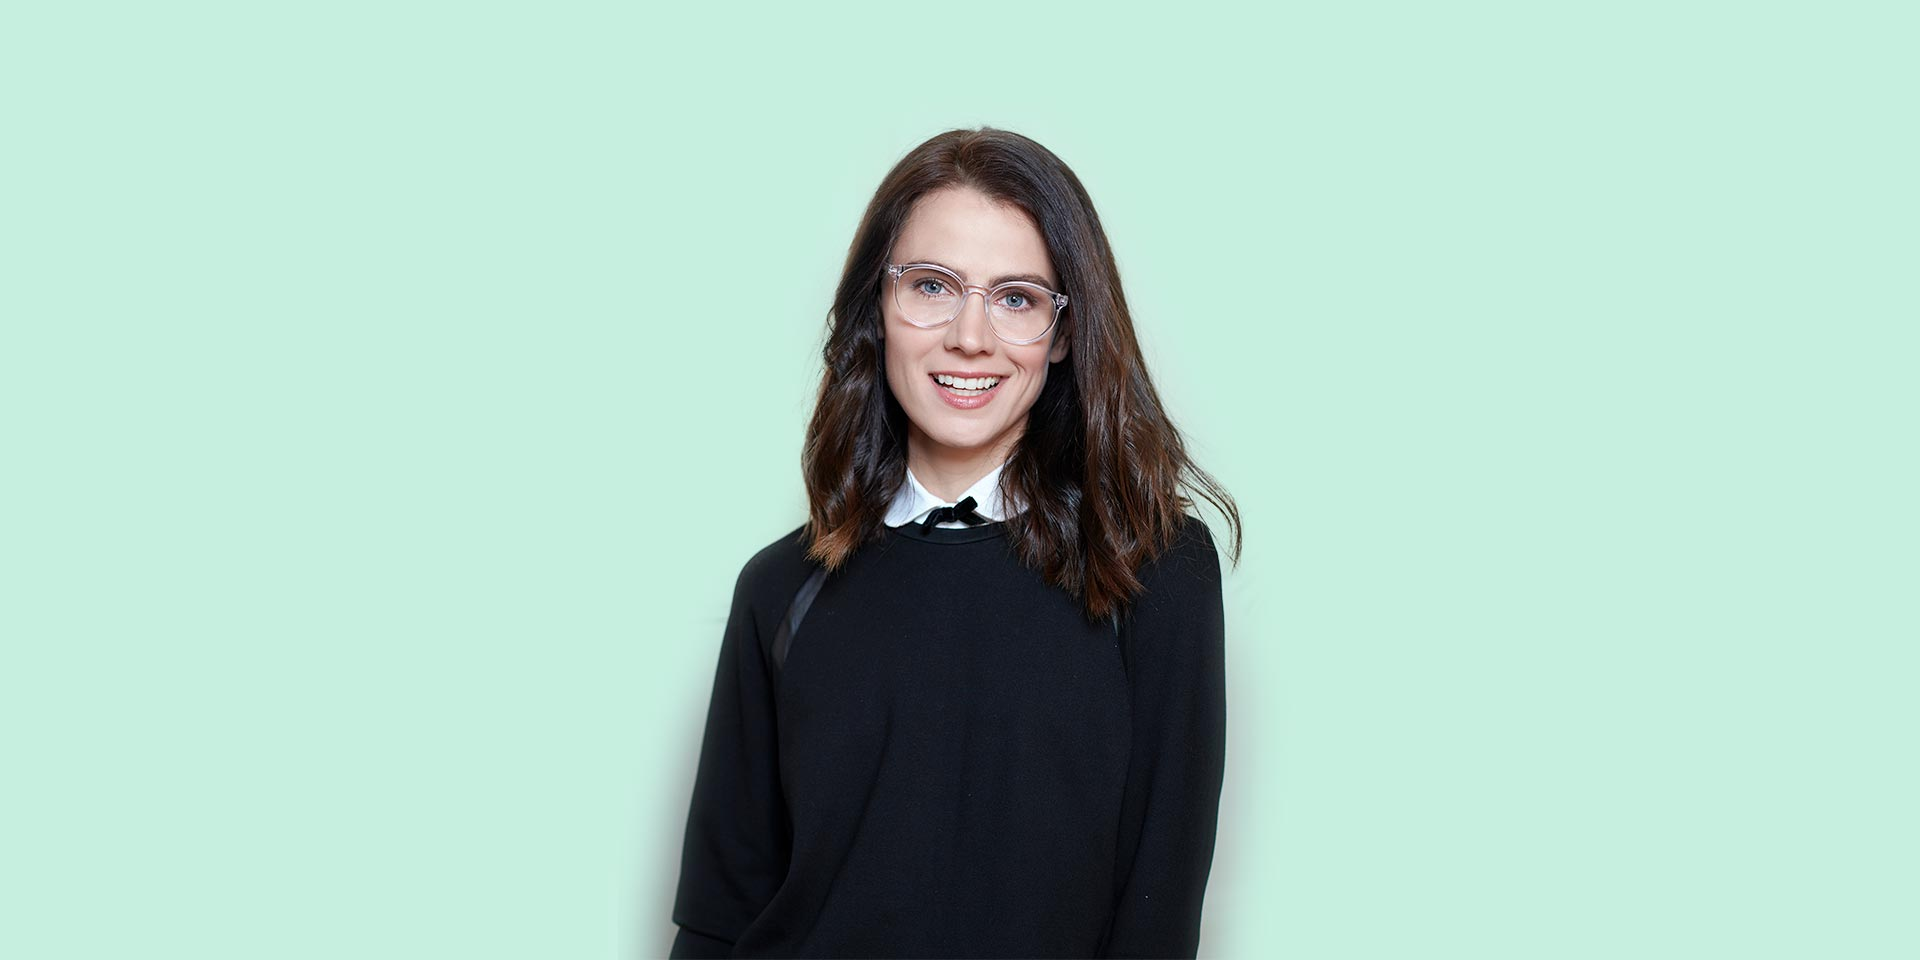 Montura de gafas graduadas para mujer Proud eyewear